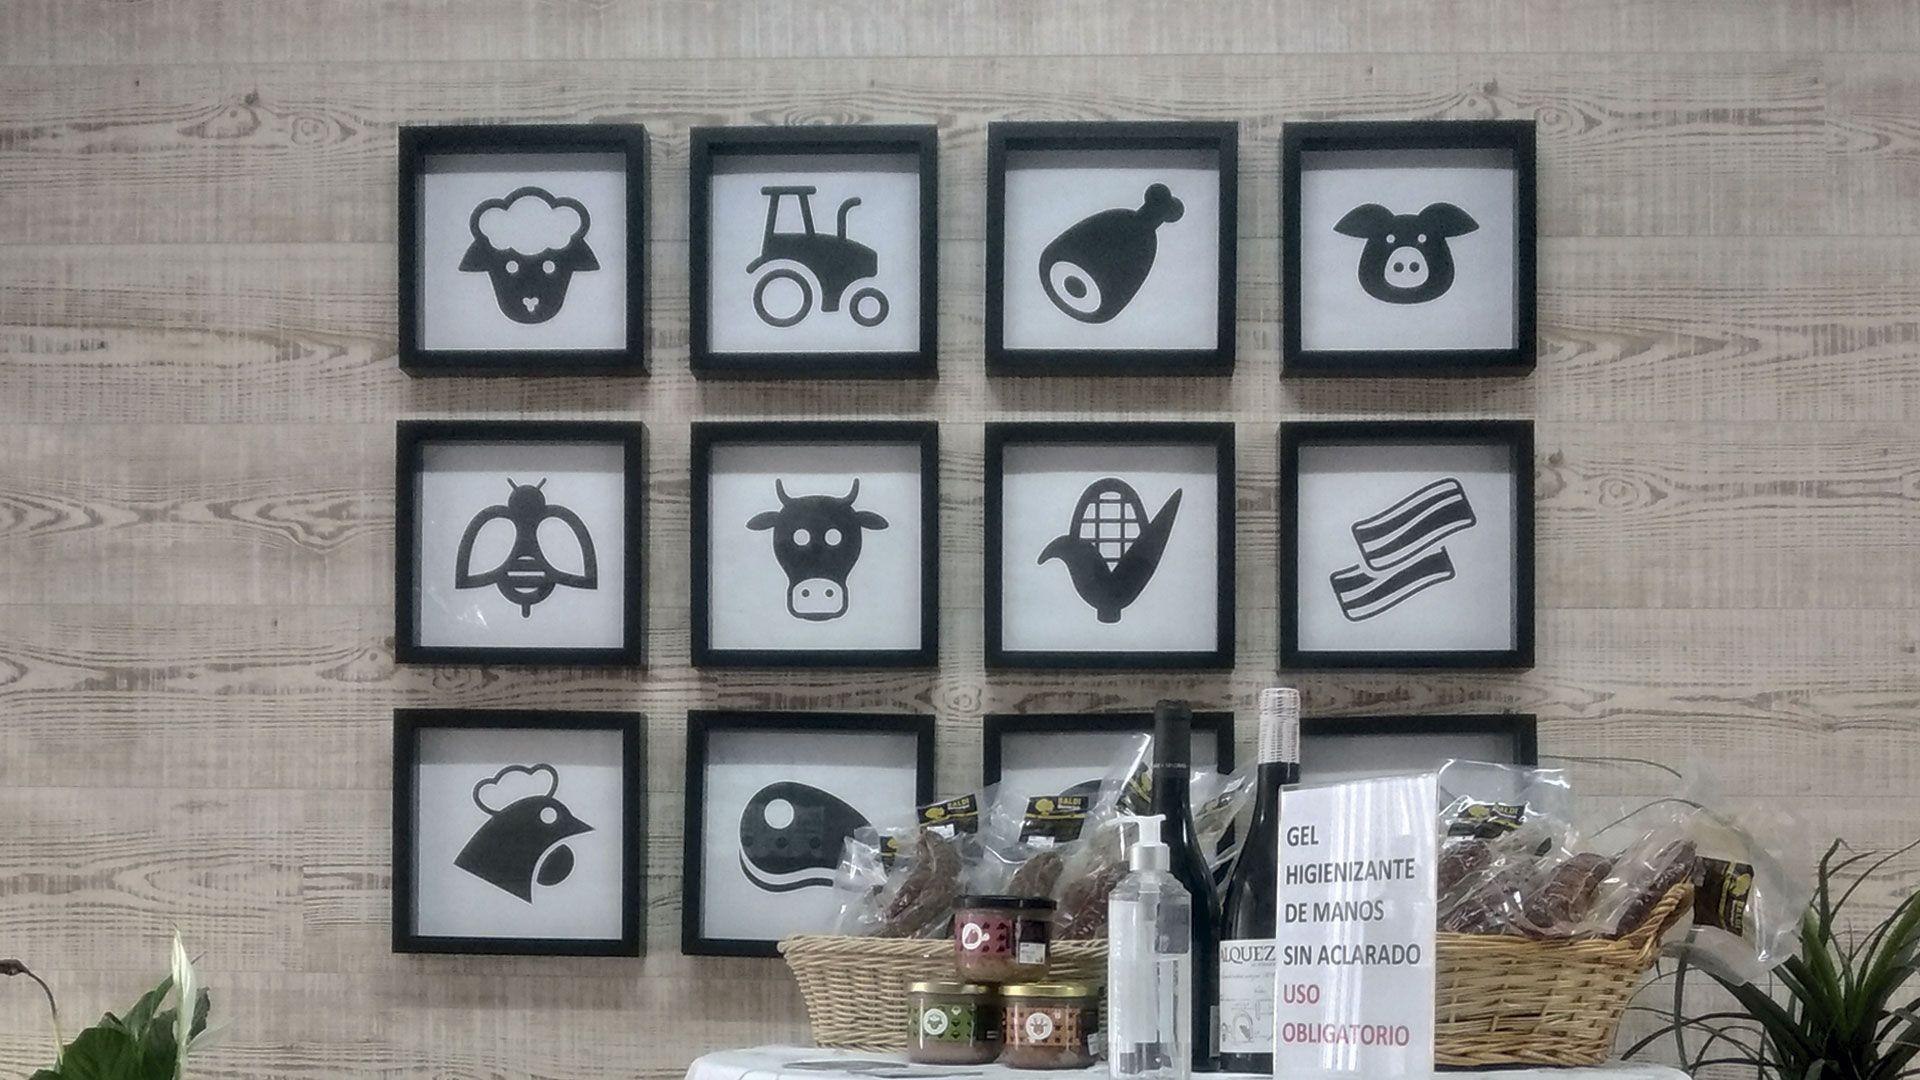 Iconos mural decorativo tienda Baldana